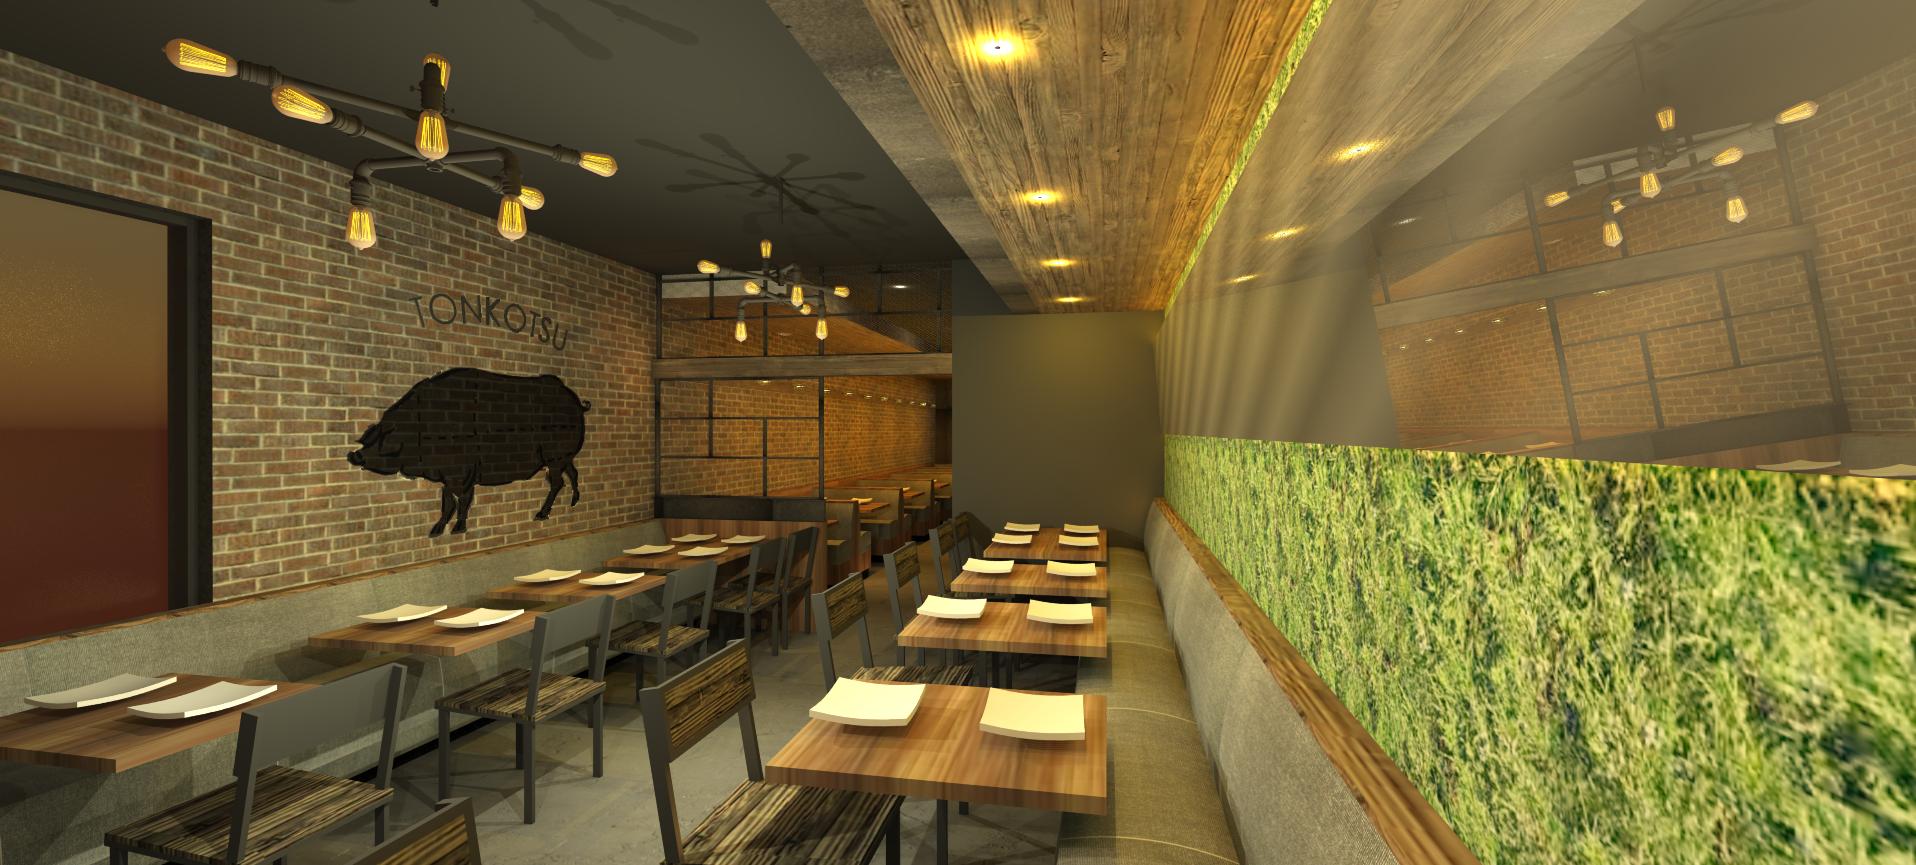 A rendering of the bar at the Jinya coming to Logan Circle. [Official]